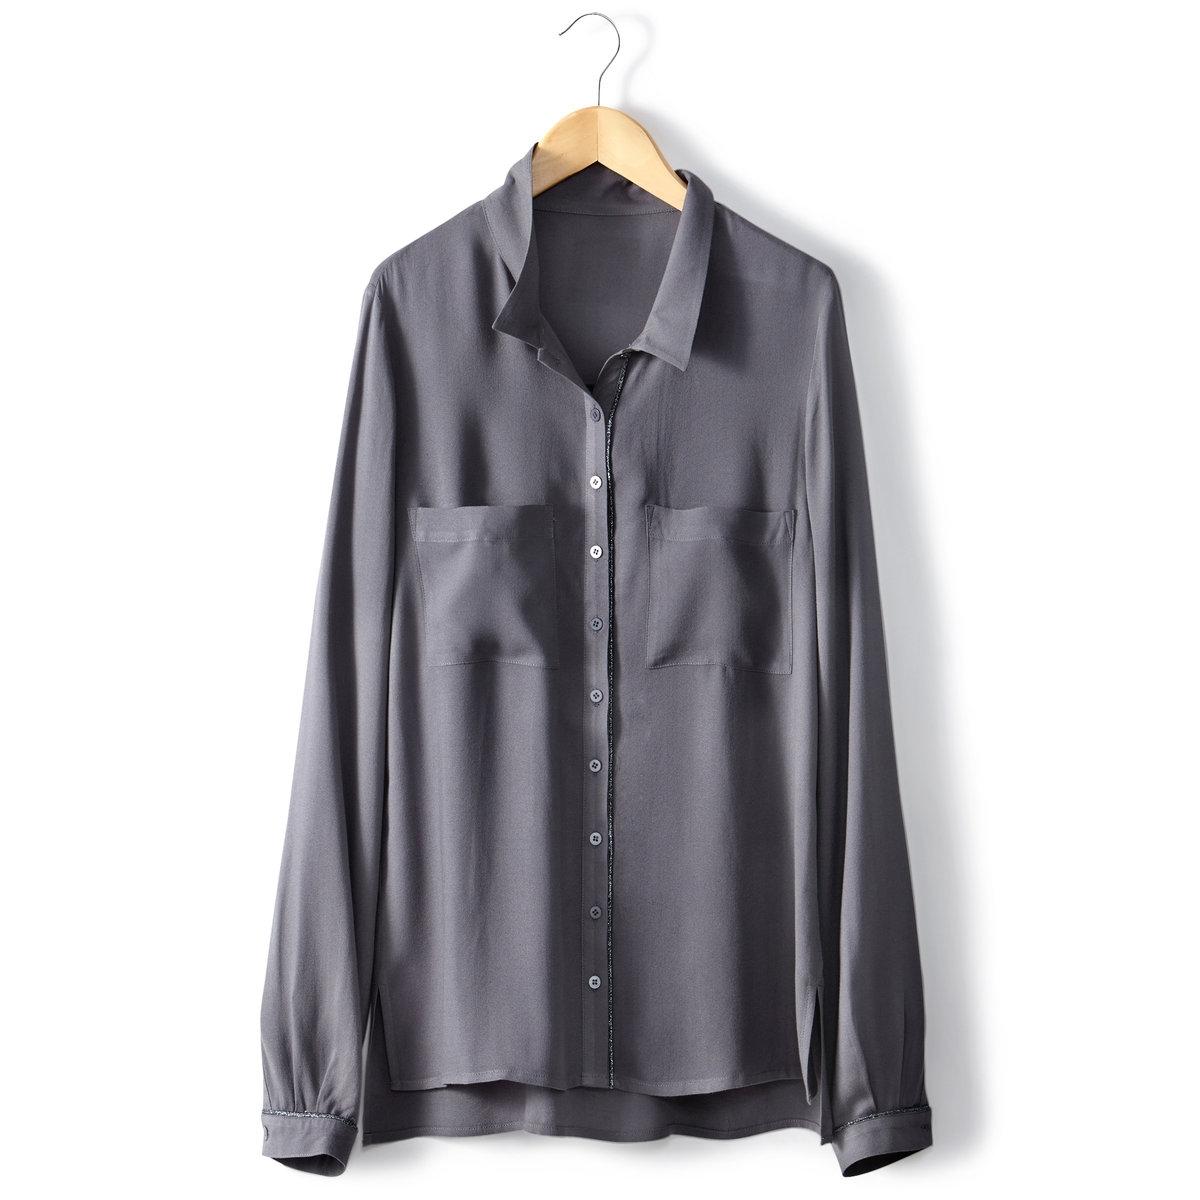 Блузка с рубашечным воротником<br><br>Цвет: серый<br>Размер: 34 (FR) - 40 (RUS)